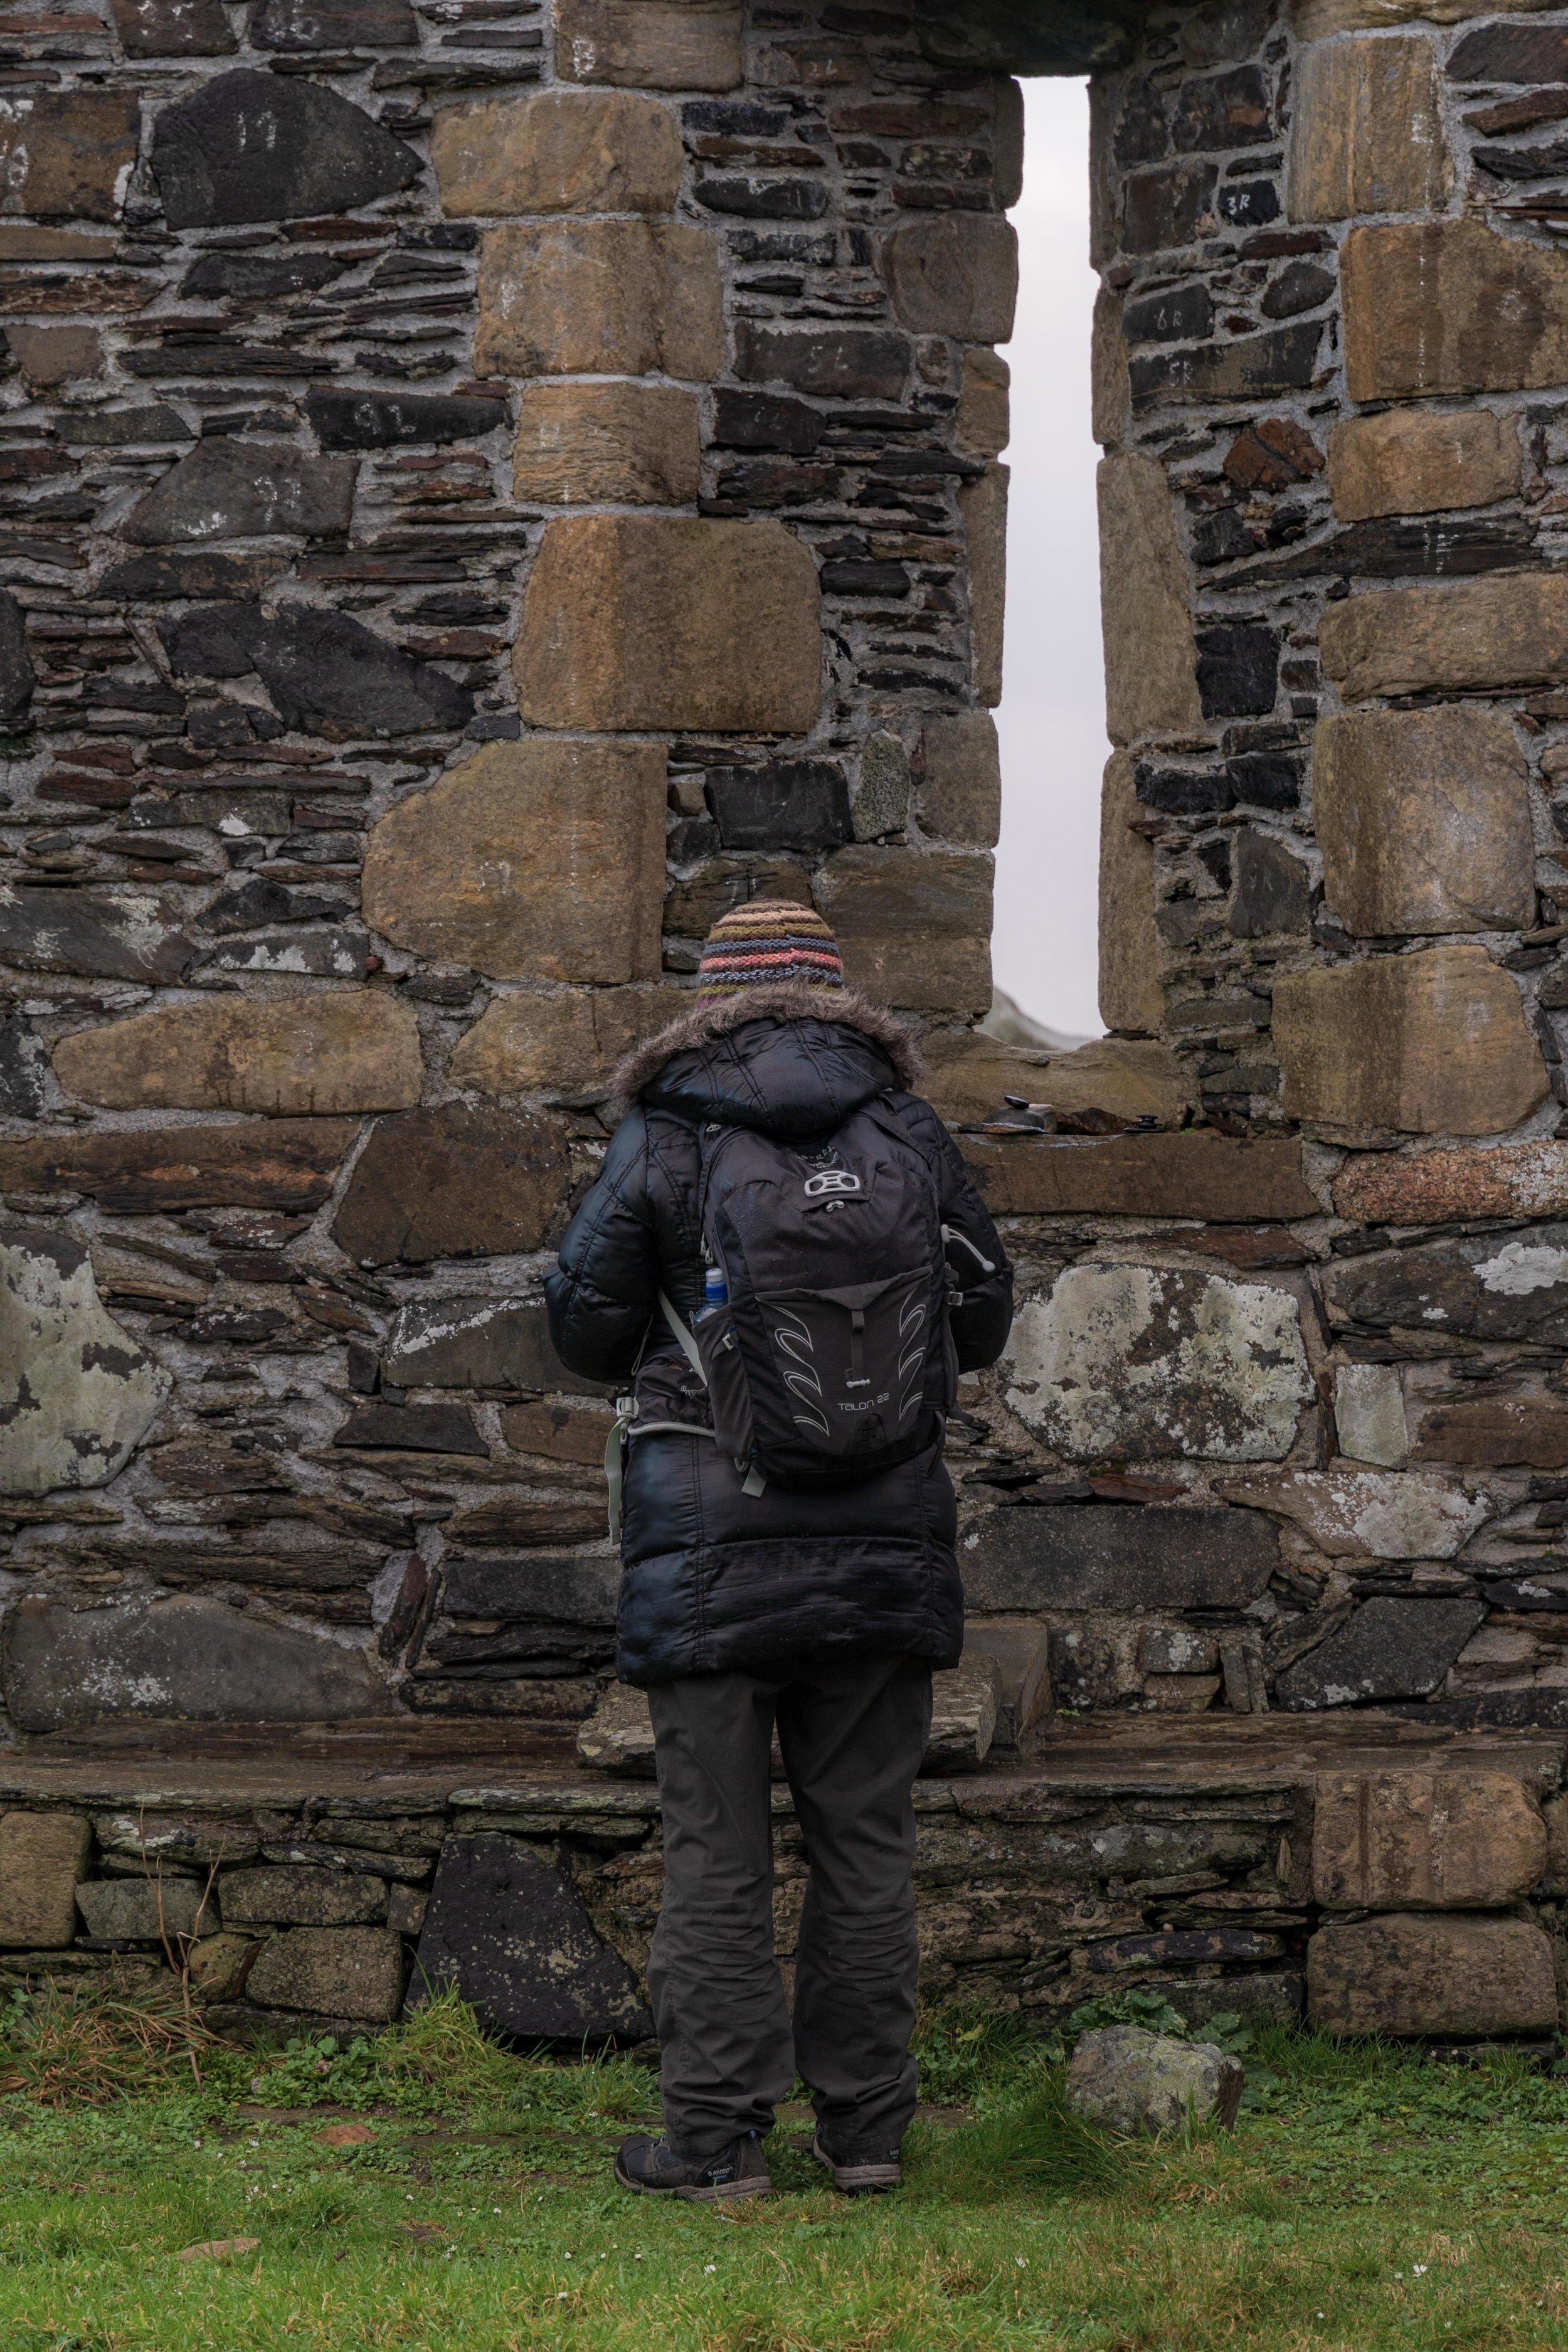 girl at old church ruin in ireland